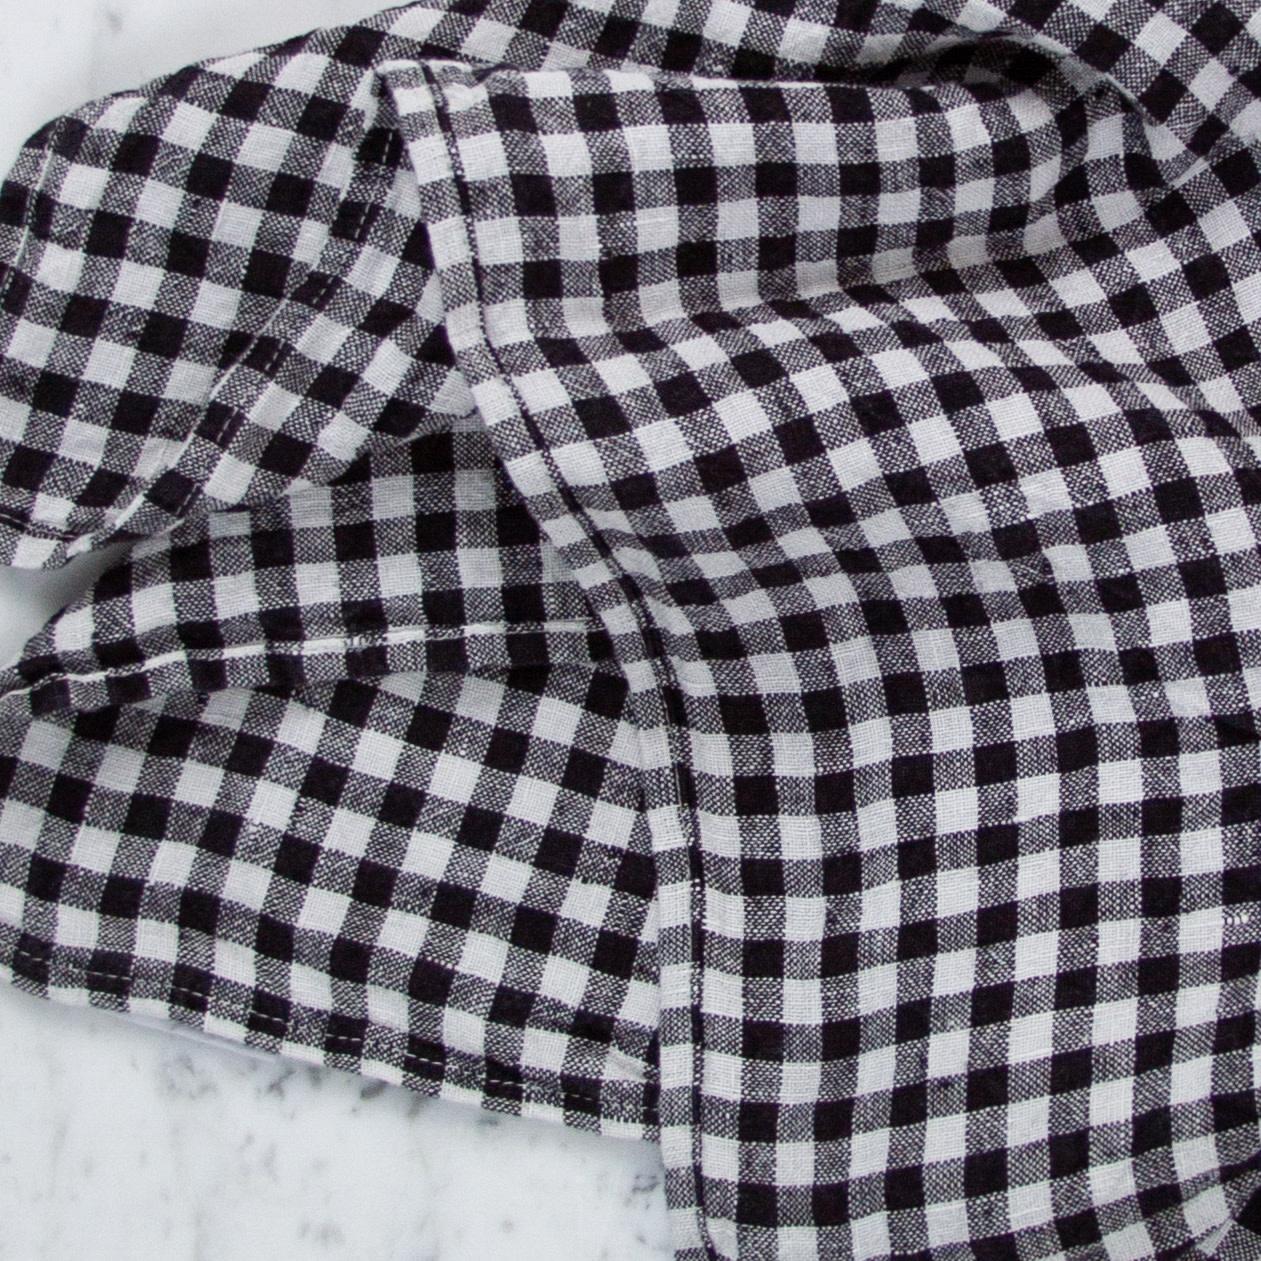 Washed French Linen Napkin - Set of 6 - Black Gingham